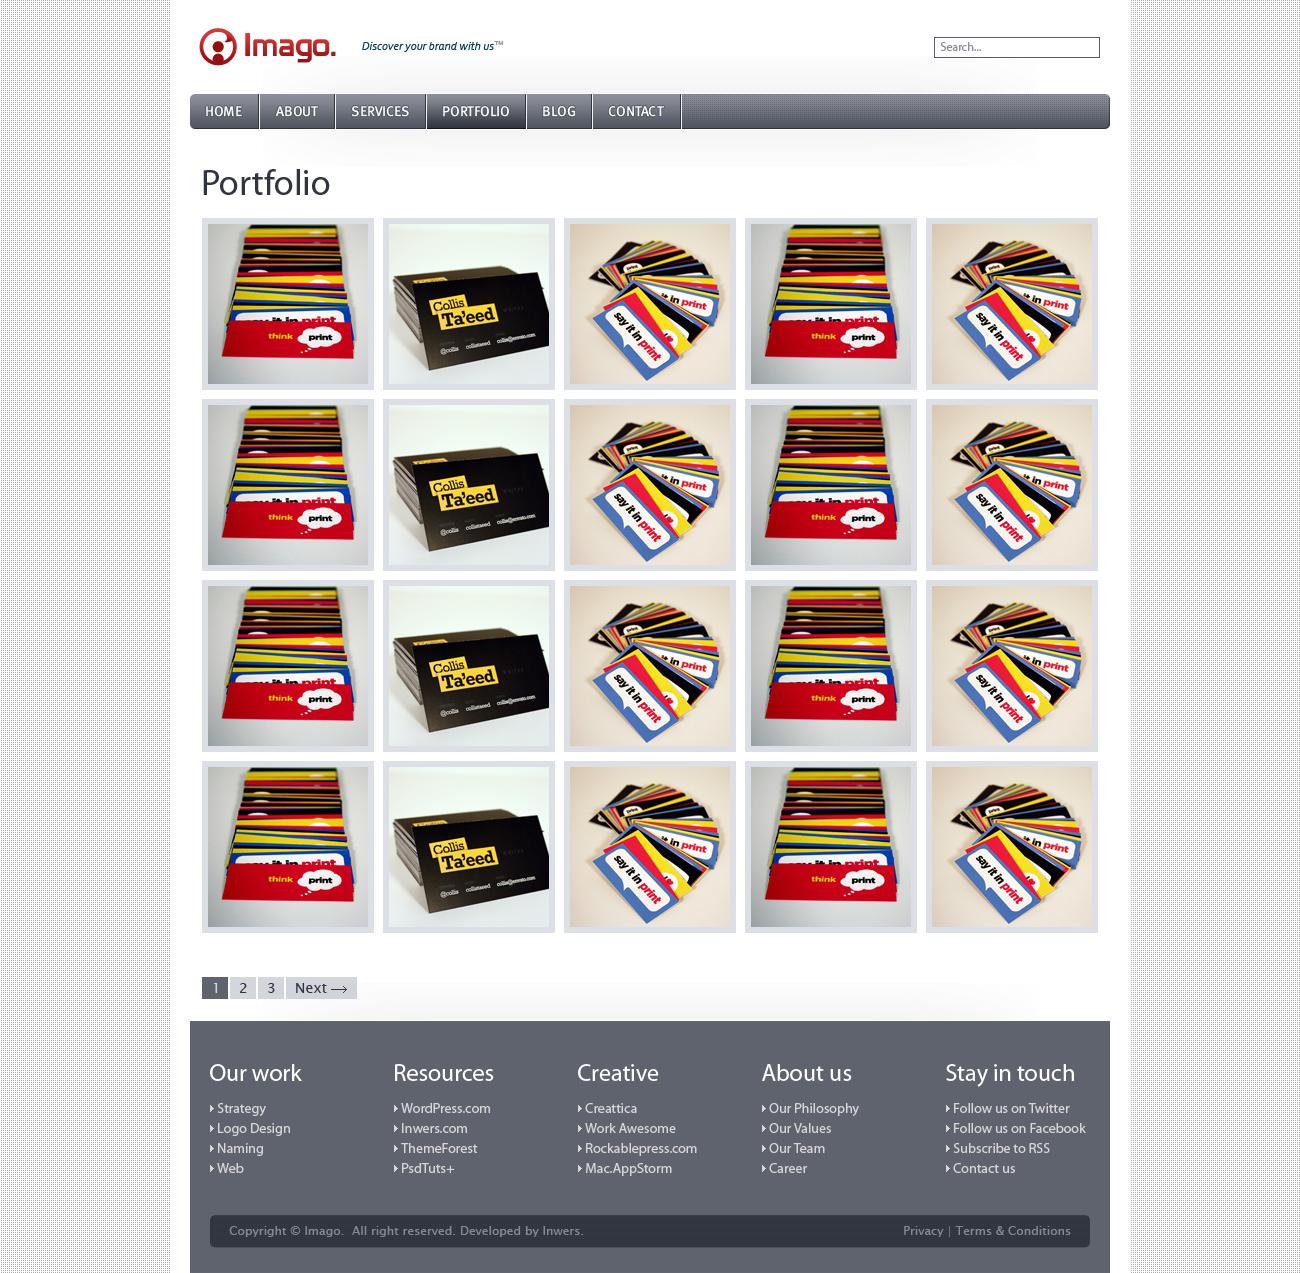 Imago - Business and Portfolio Template - 4_imago_portfolio_vers_1